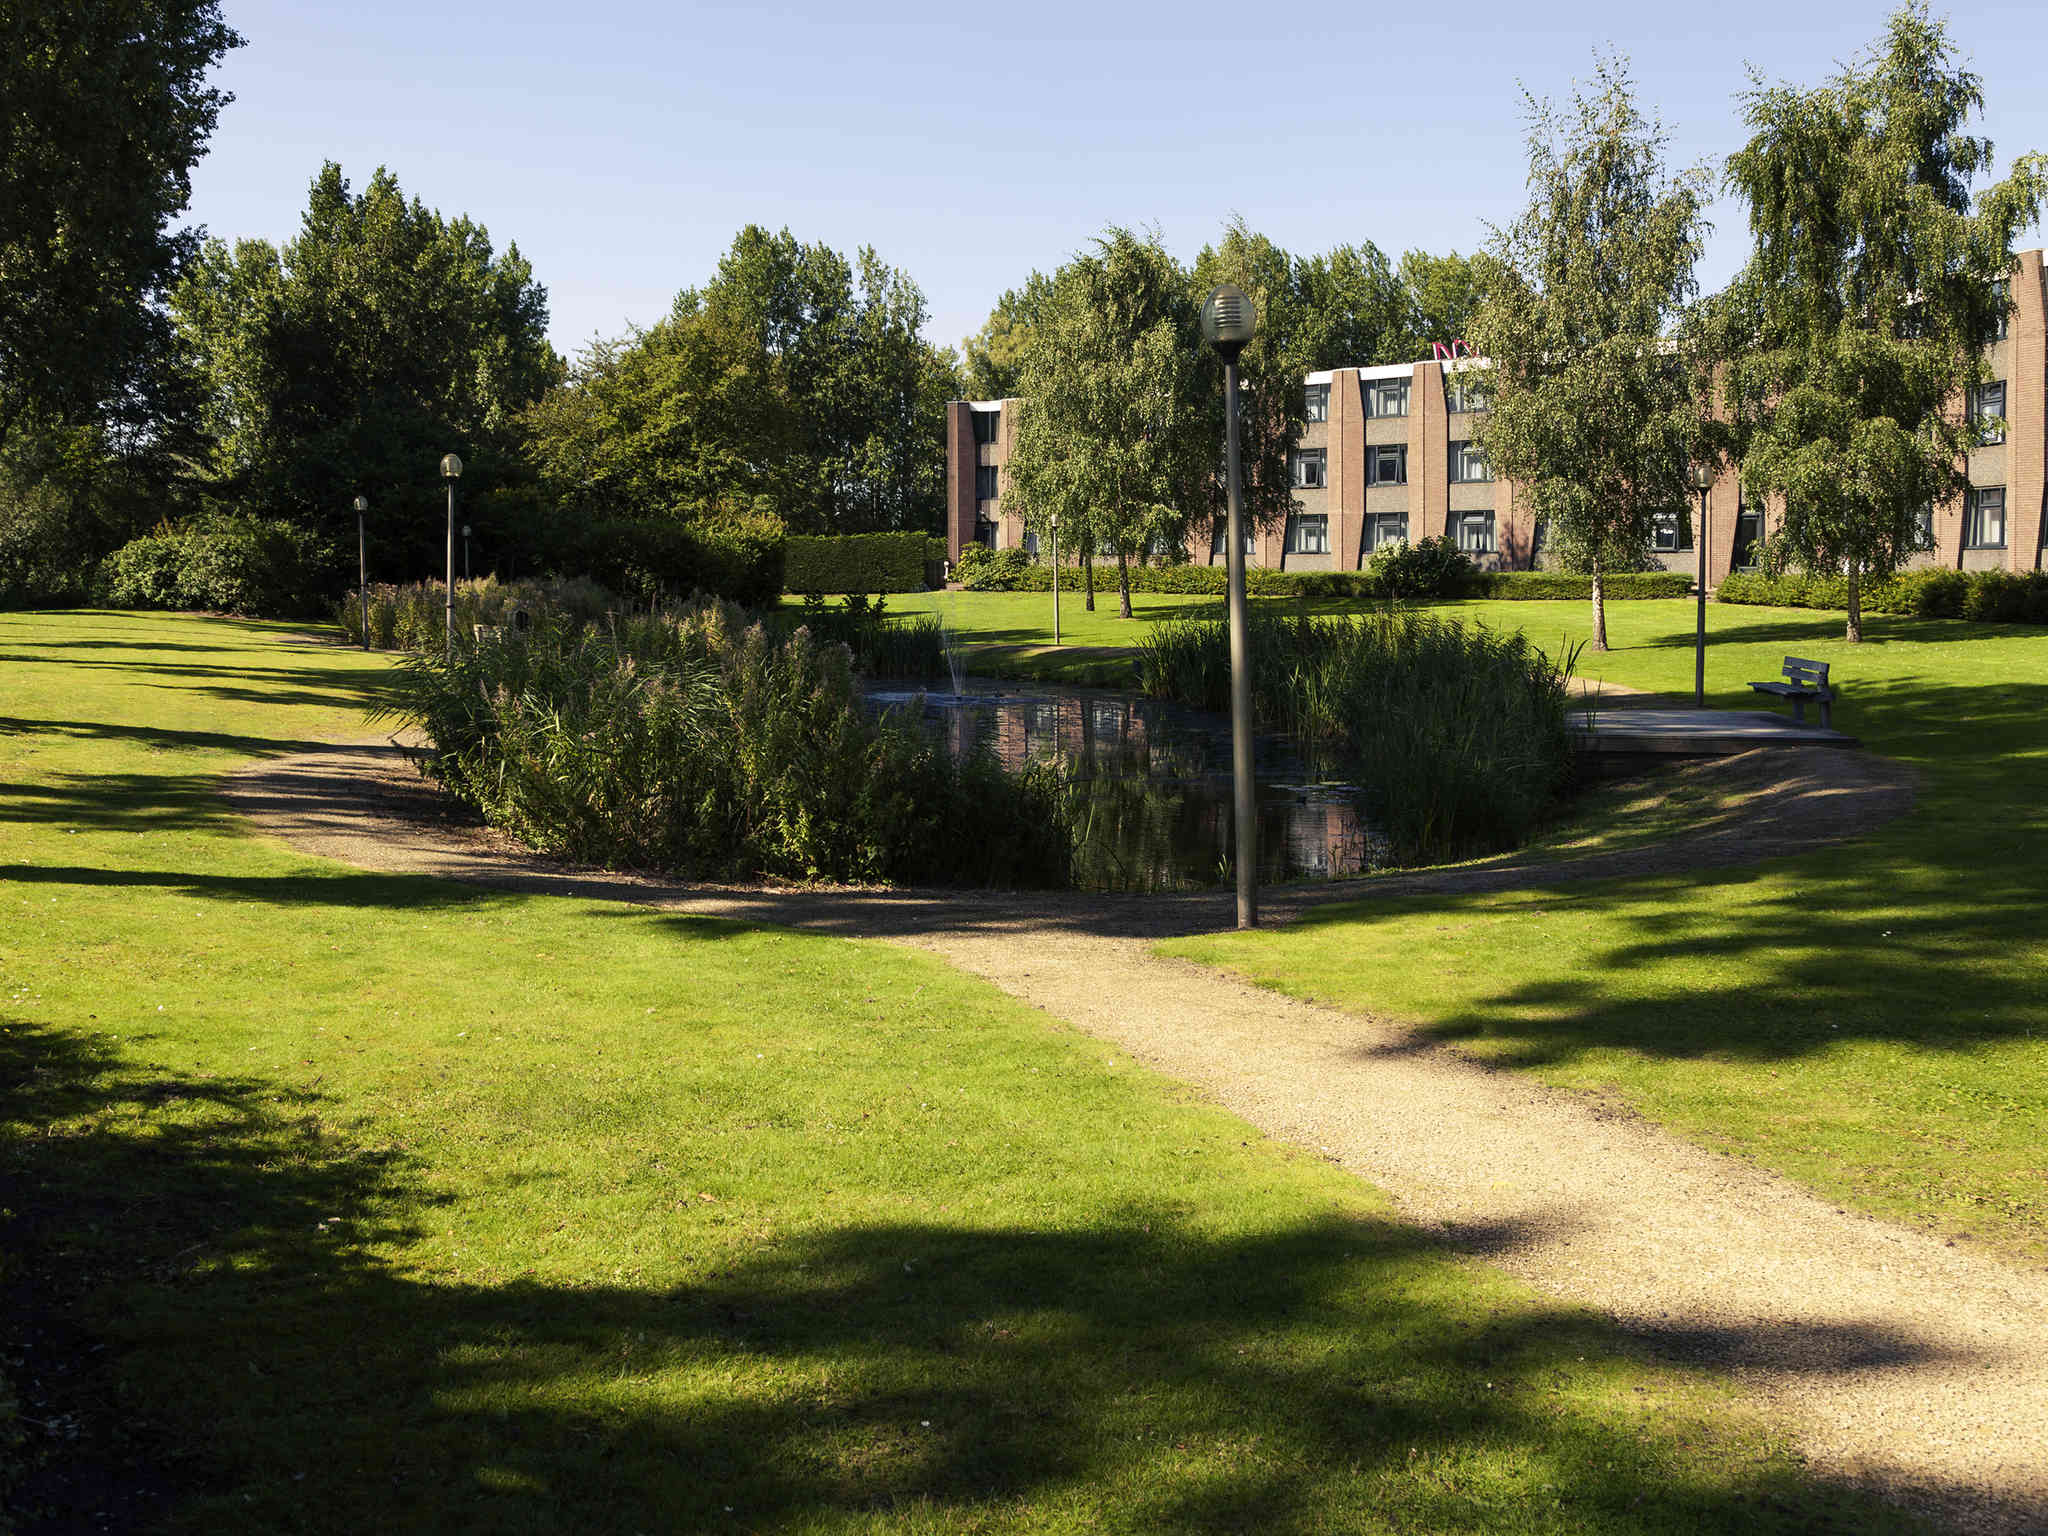 فندق - فندق مركيور Mercure أمستردام إيربورت